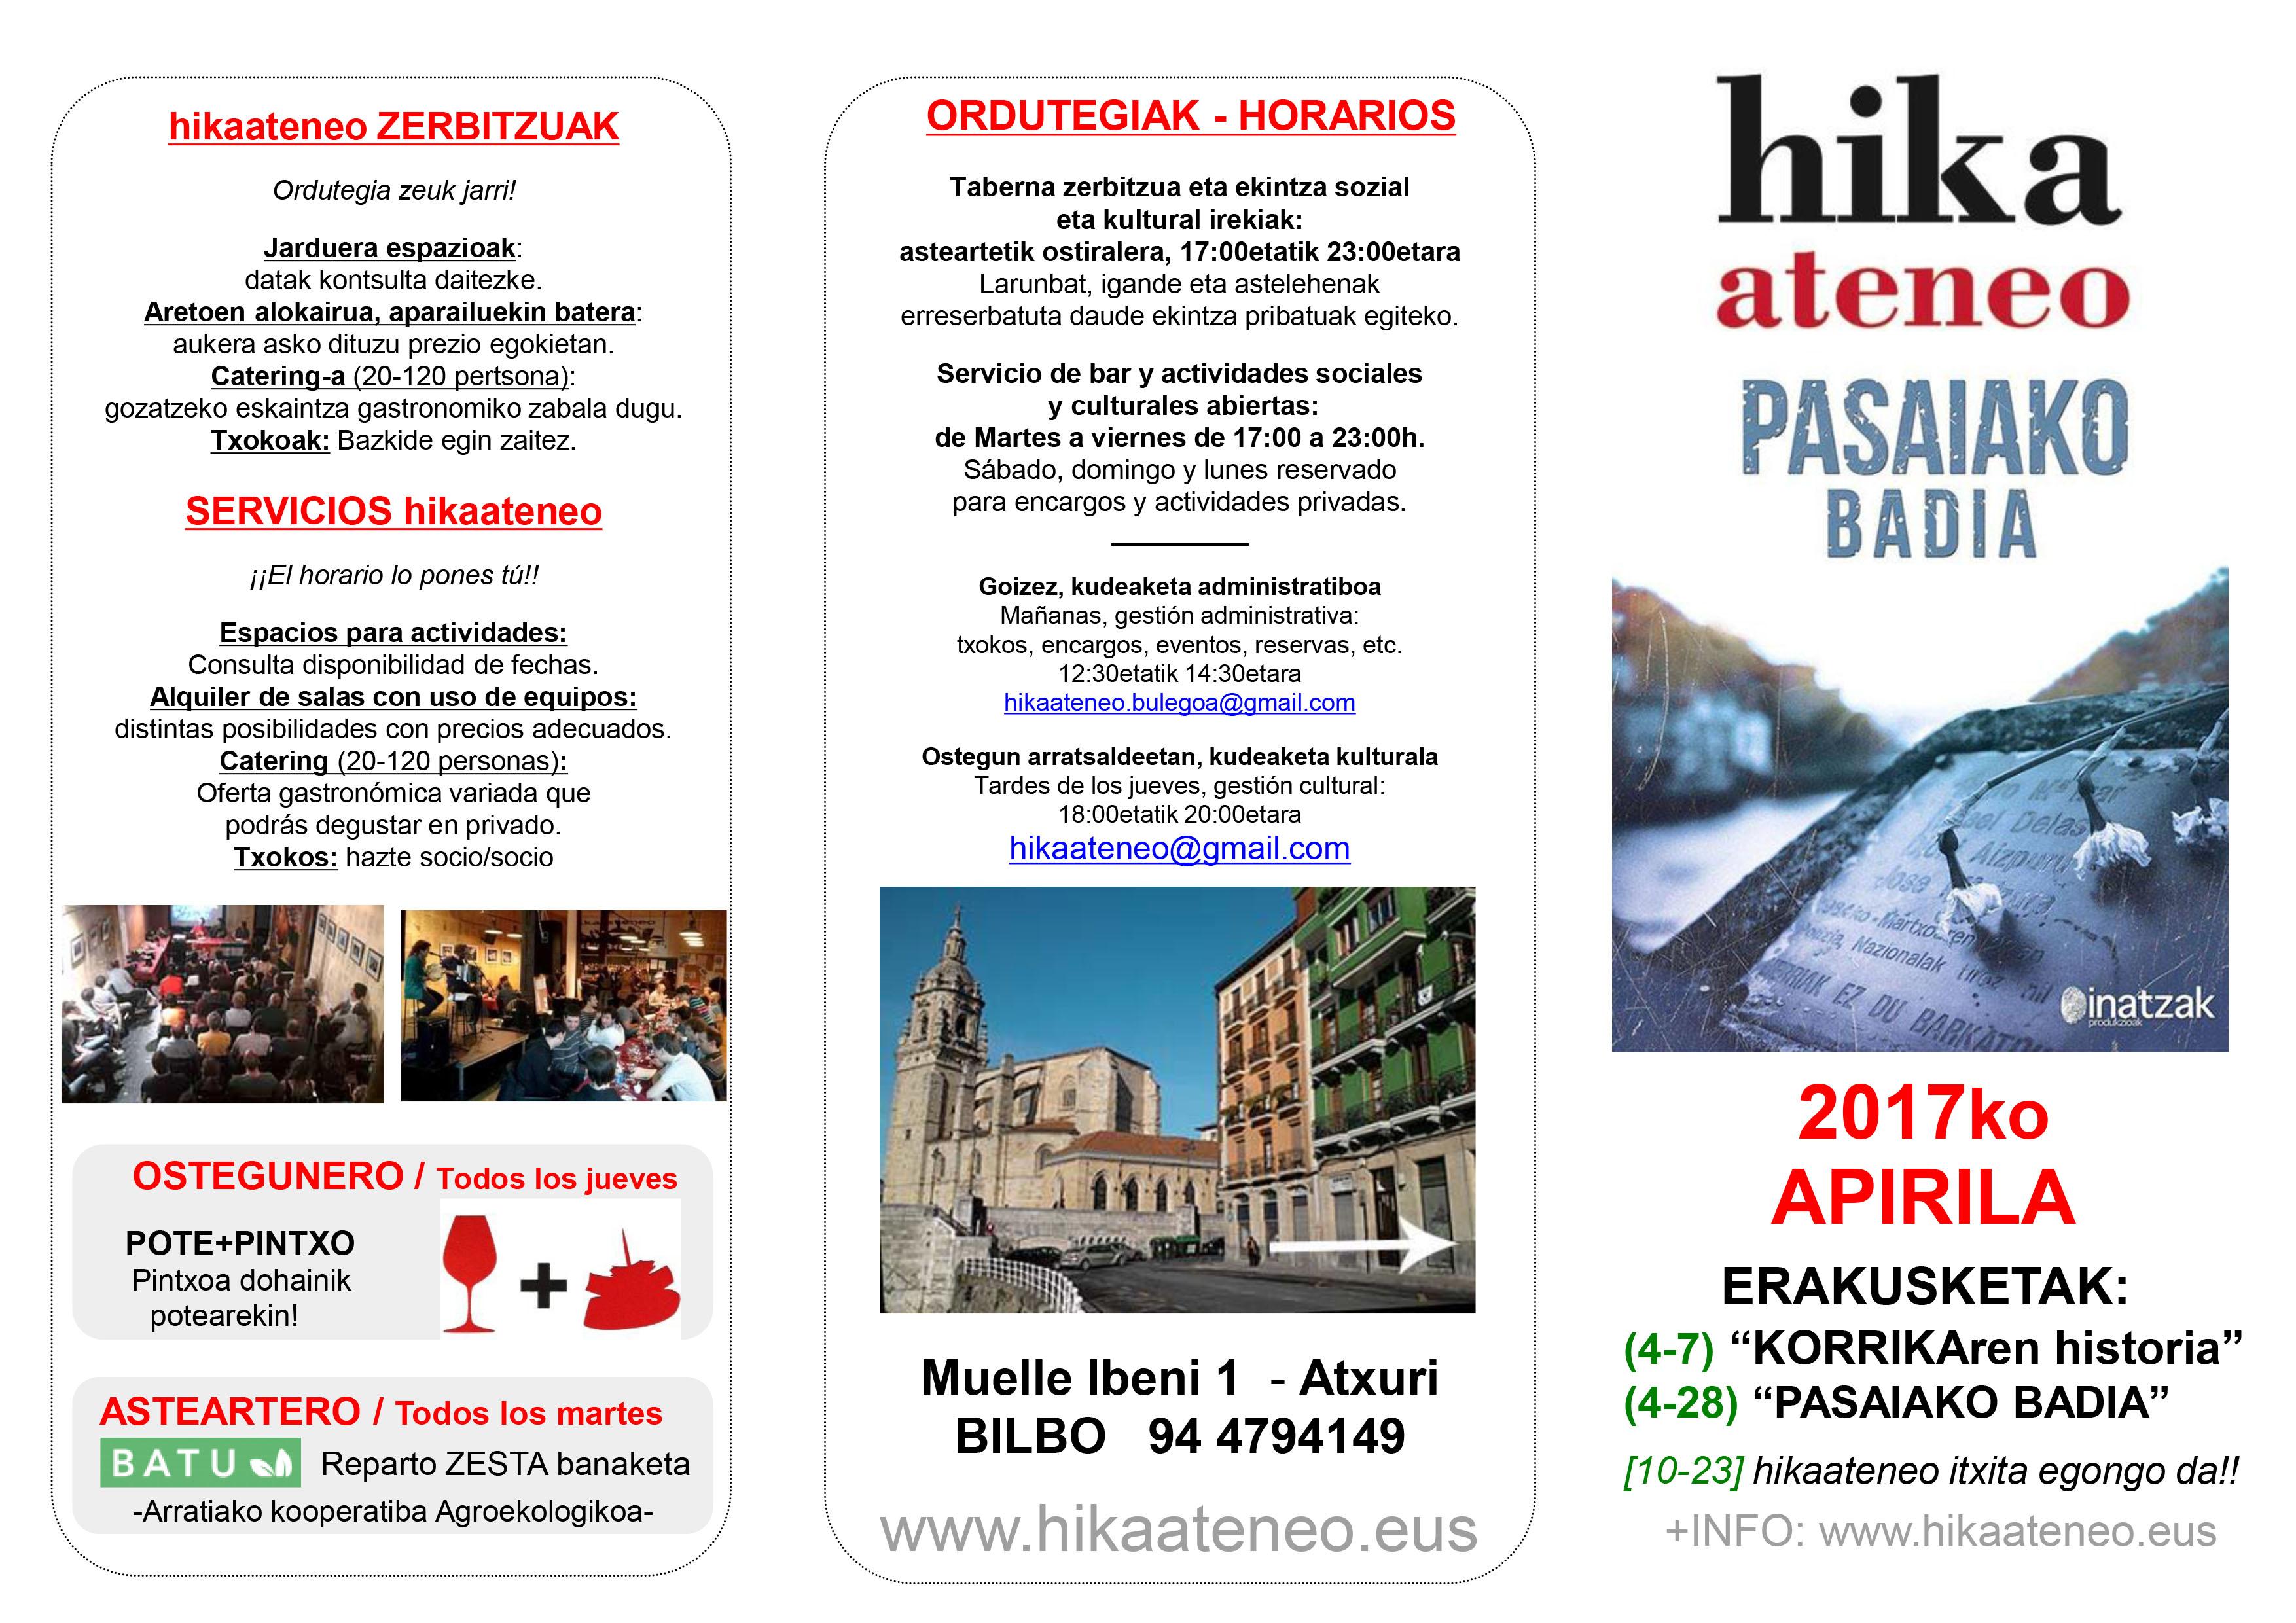 Agenda Hika Ateneo Bilbao Apirilak 2017 Abril